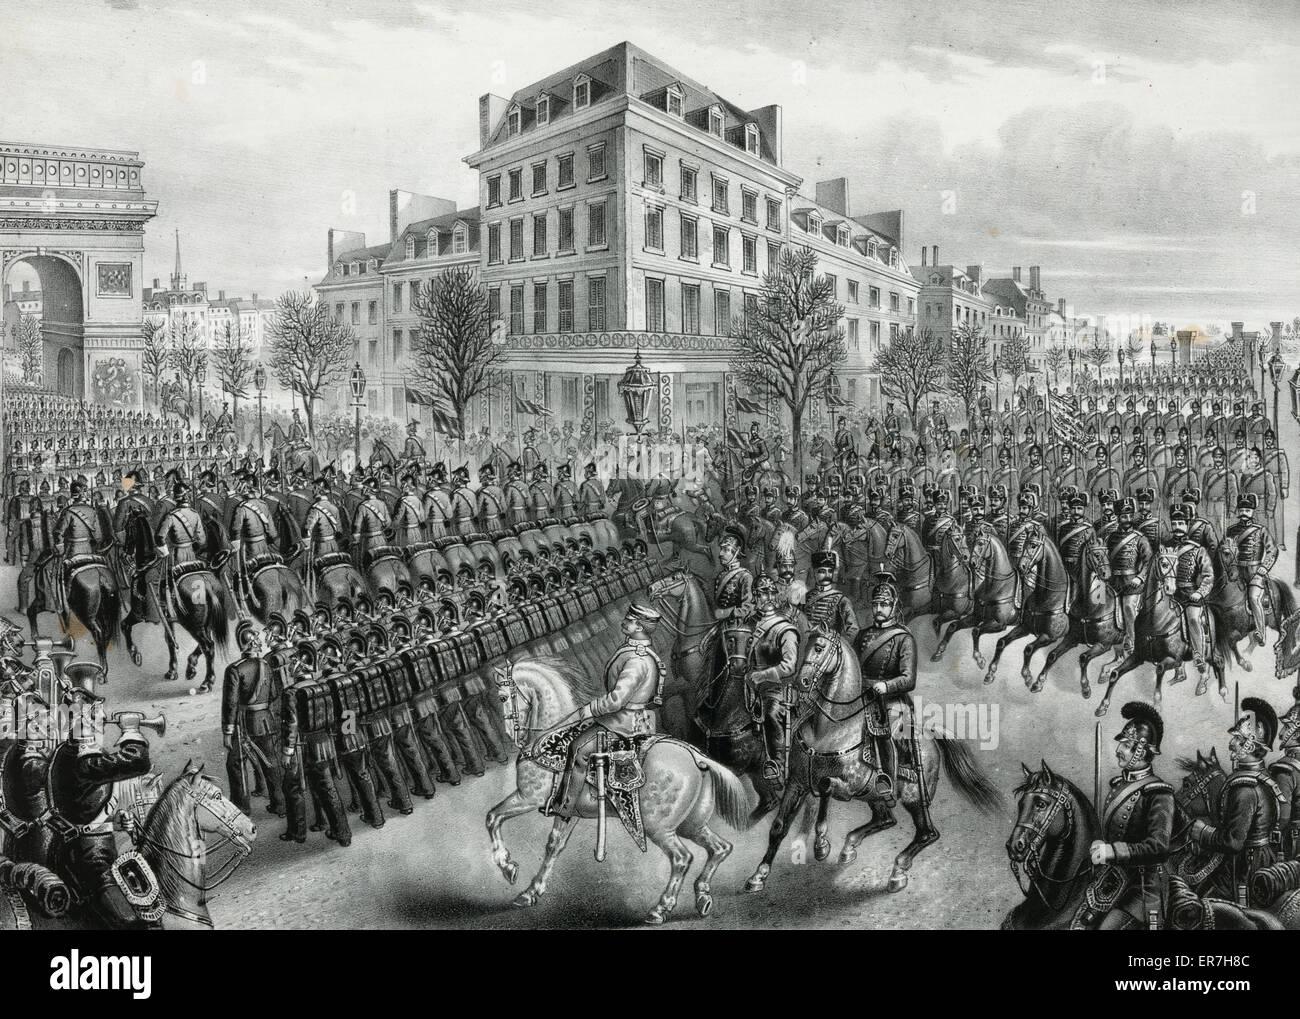 Triumphal entry of the Germans into Paris. Date c1871. - Stock Image